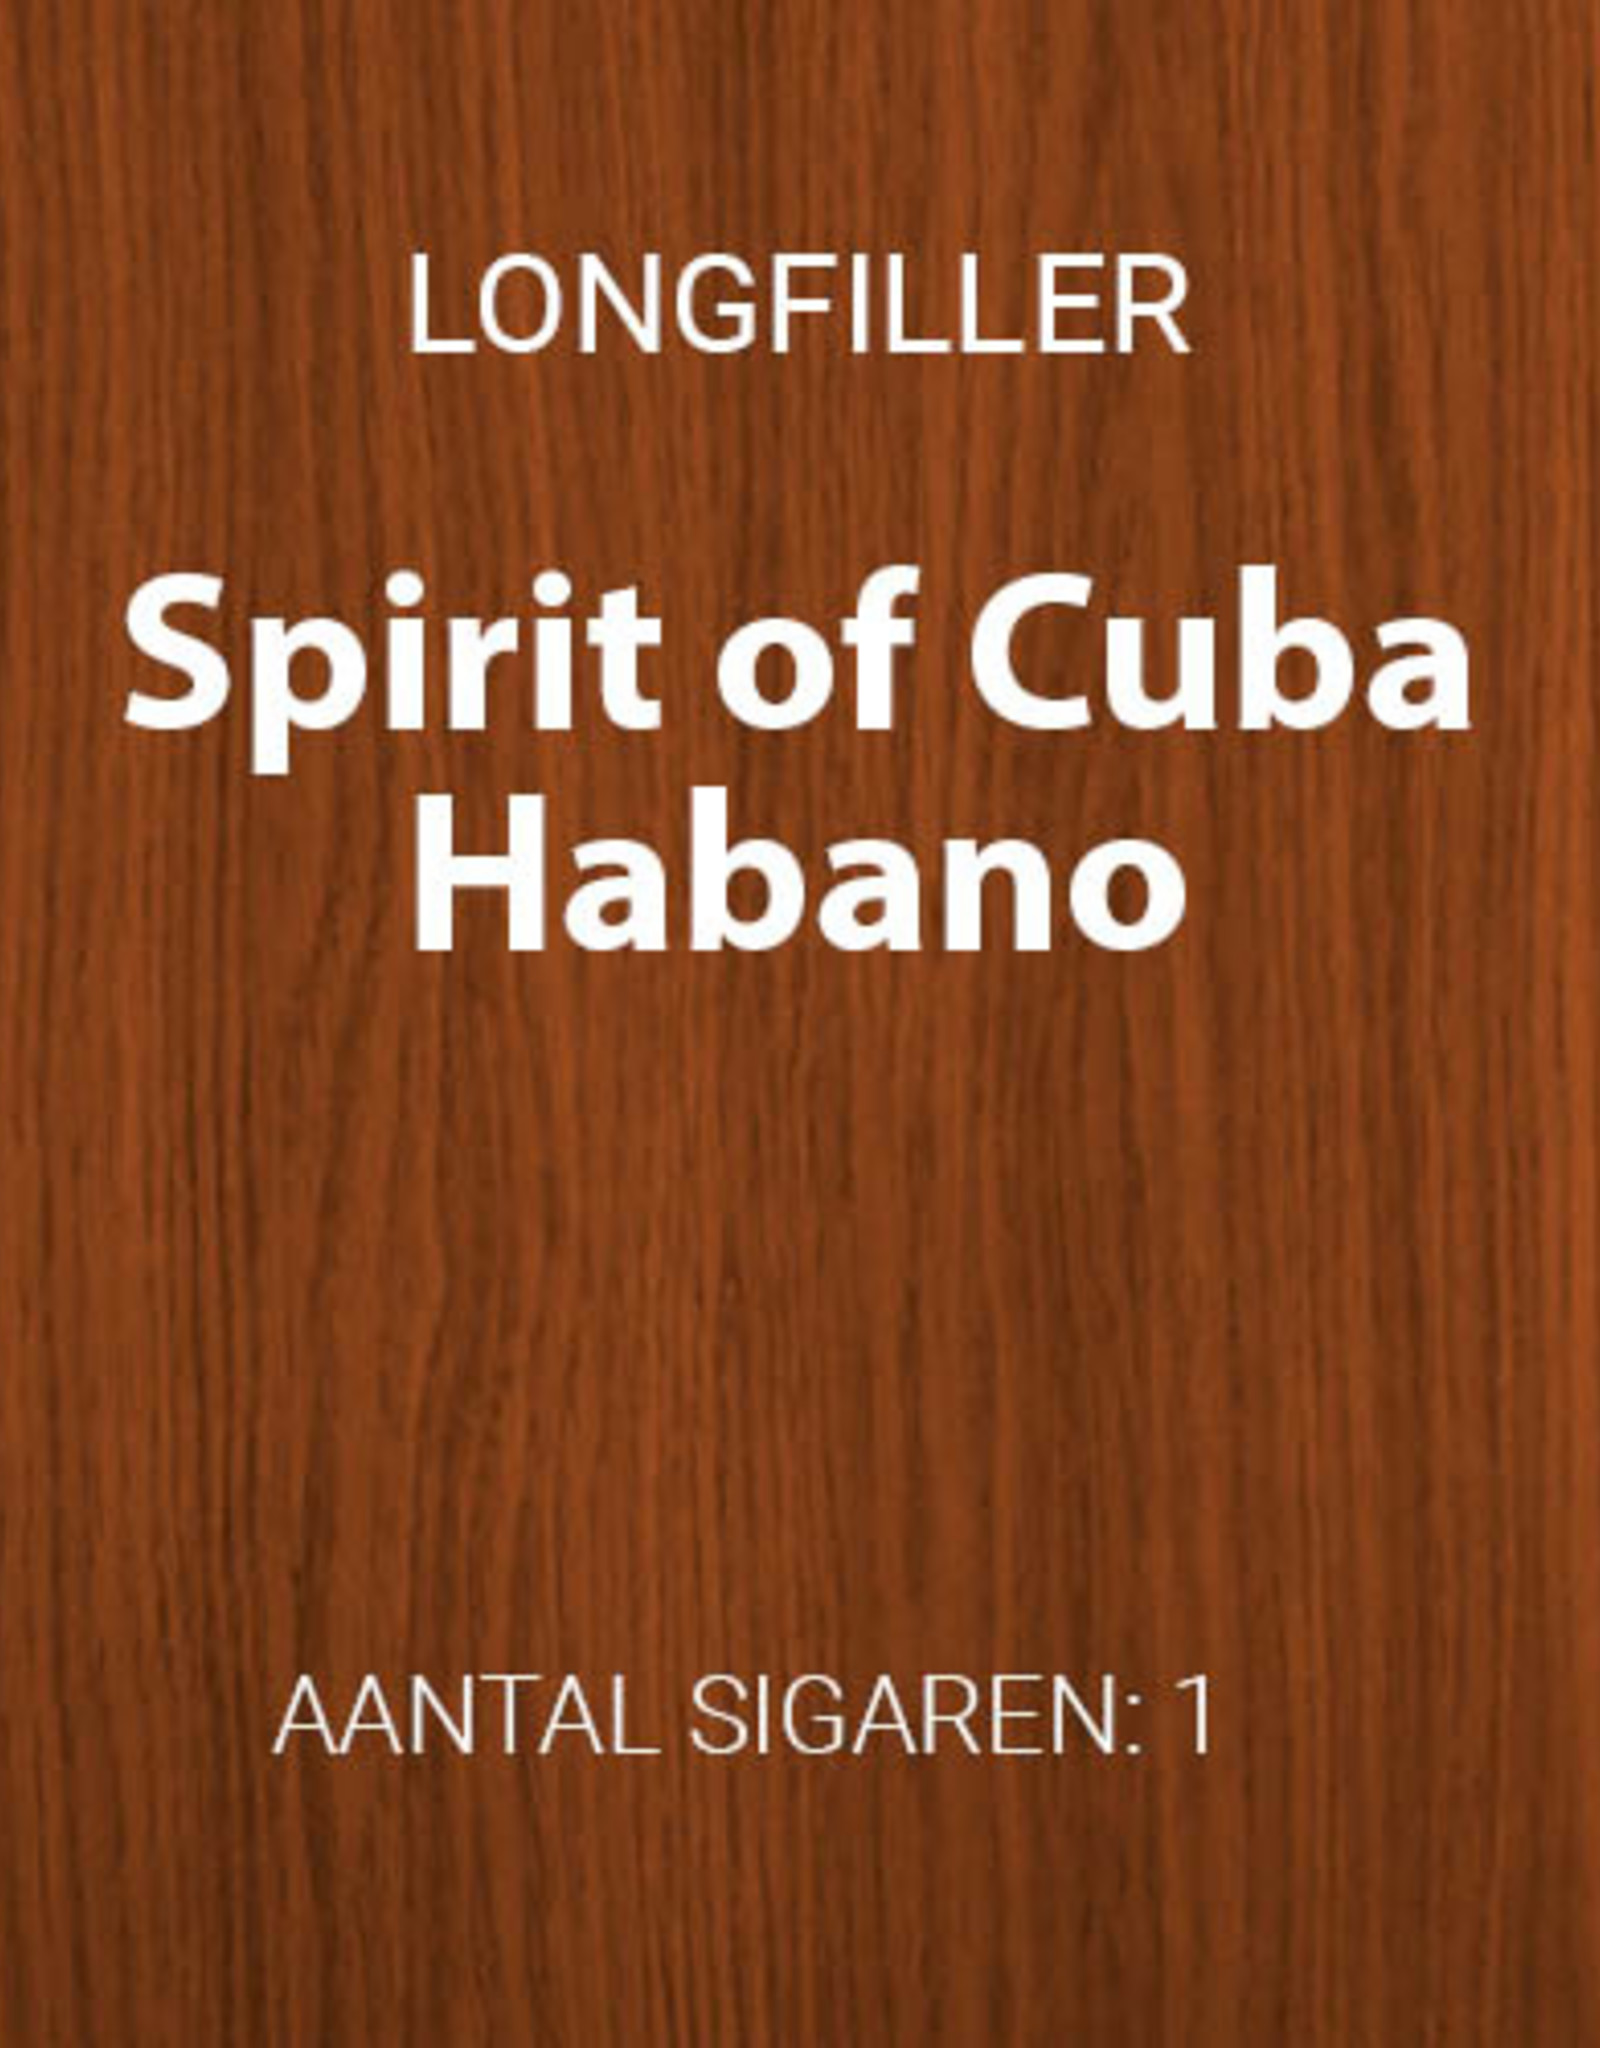 Alec Bradley Spirit of Cuba